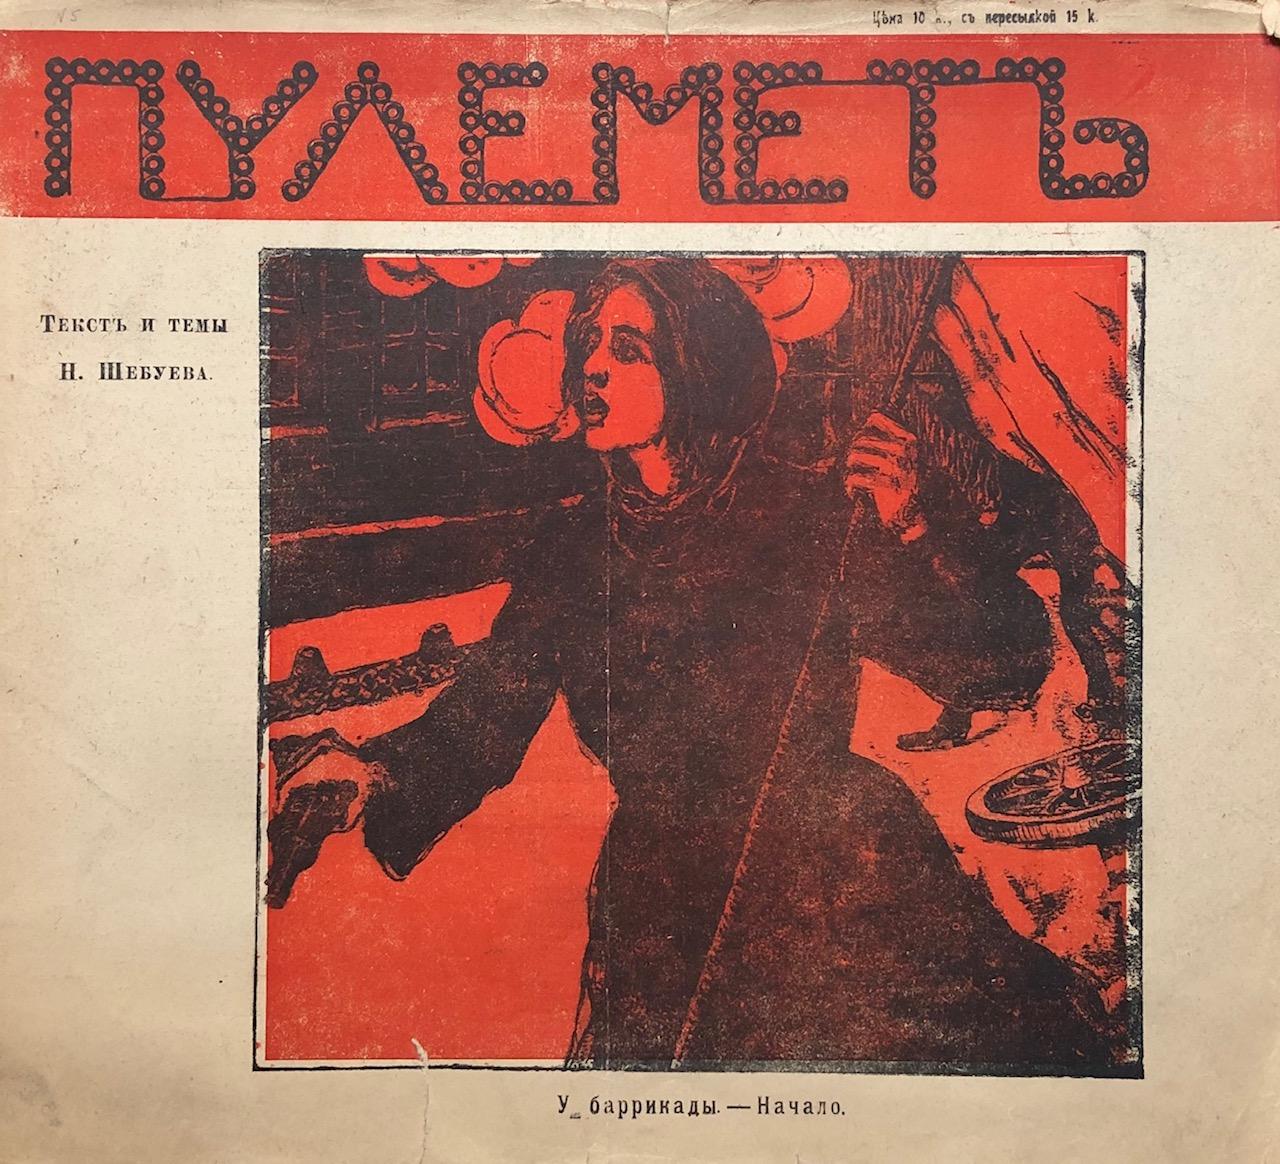 Lot 497 - La mitrailleuse. 4 livr. de 1905-1906 & 3 livr. de 1917. Rare! 1) Пулемет. [...]